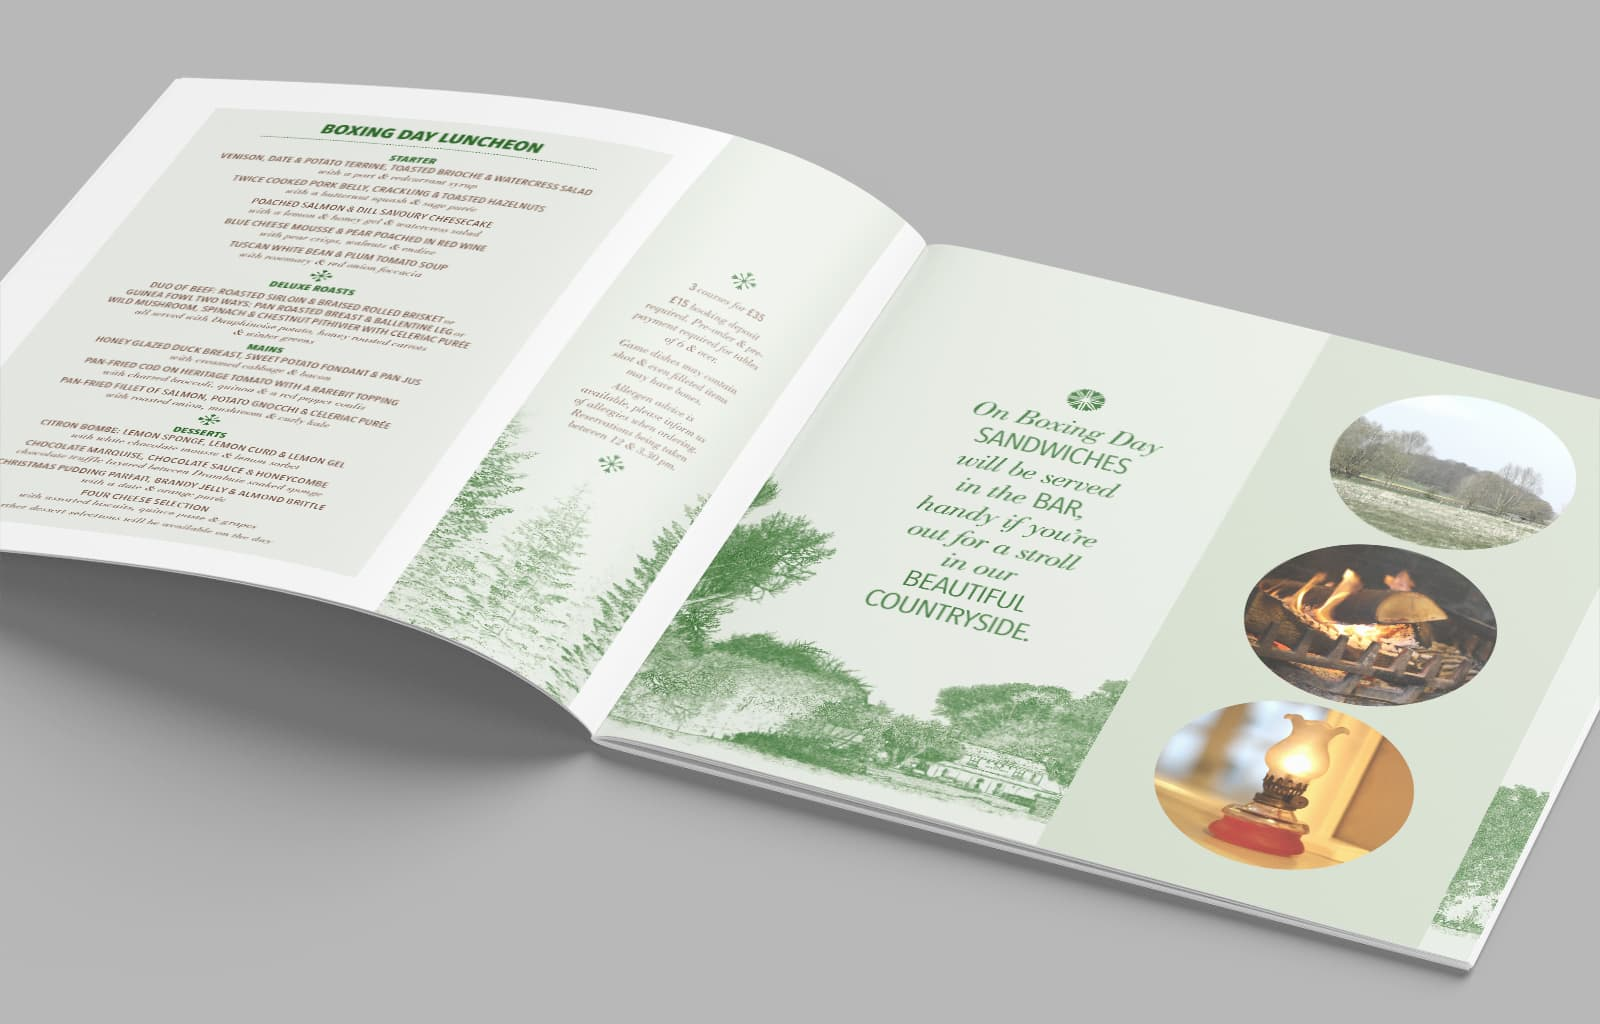 Henny Swan Christmas Brochure Spread